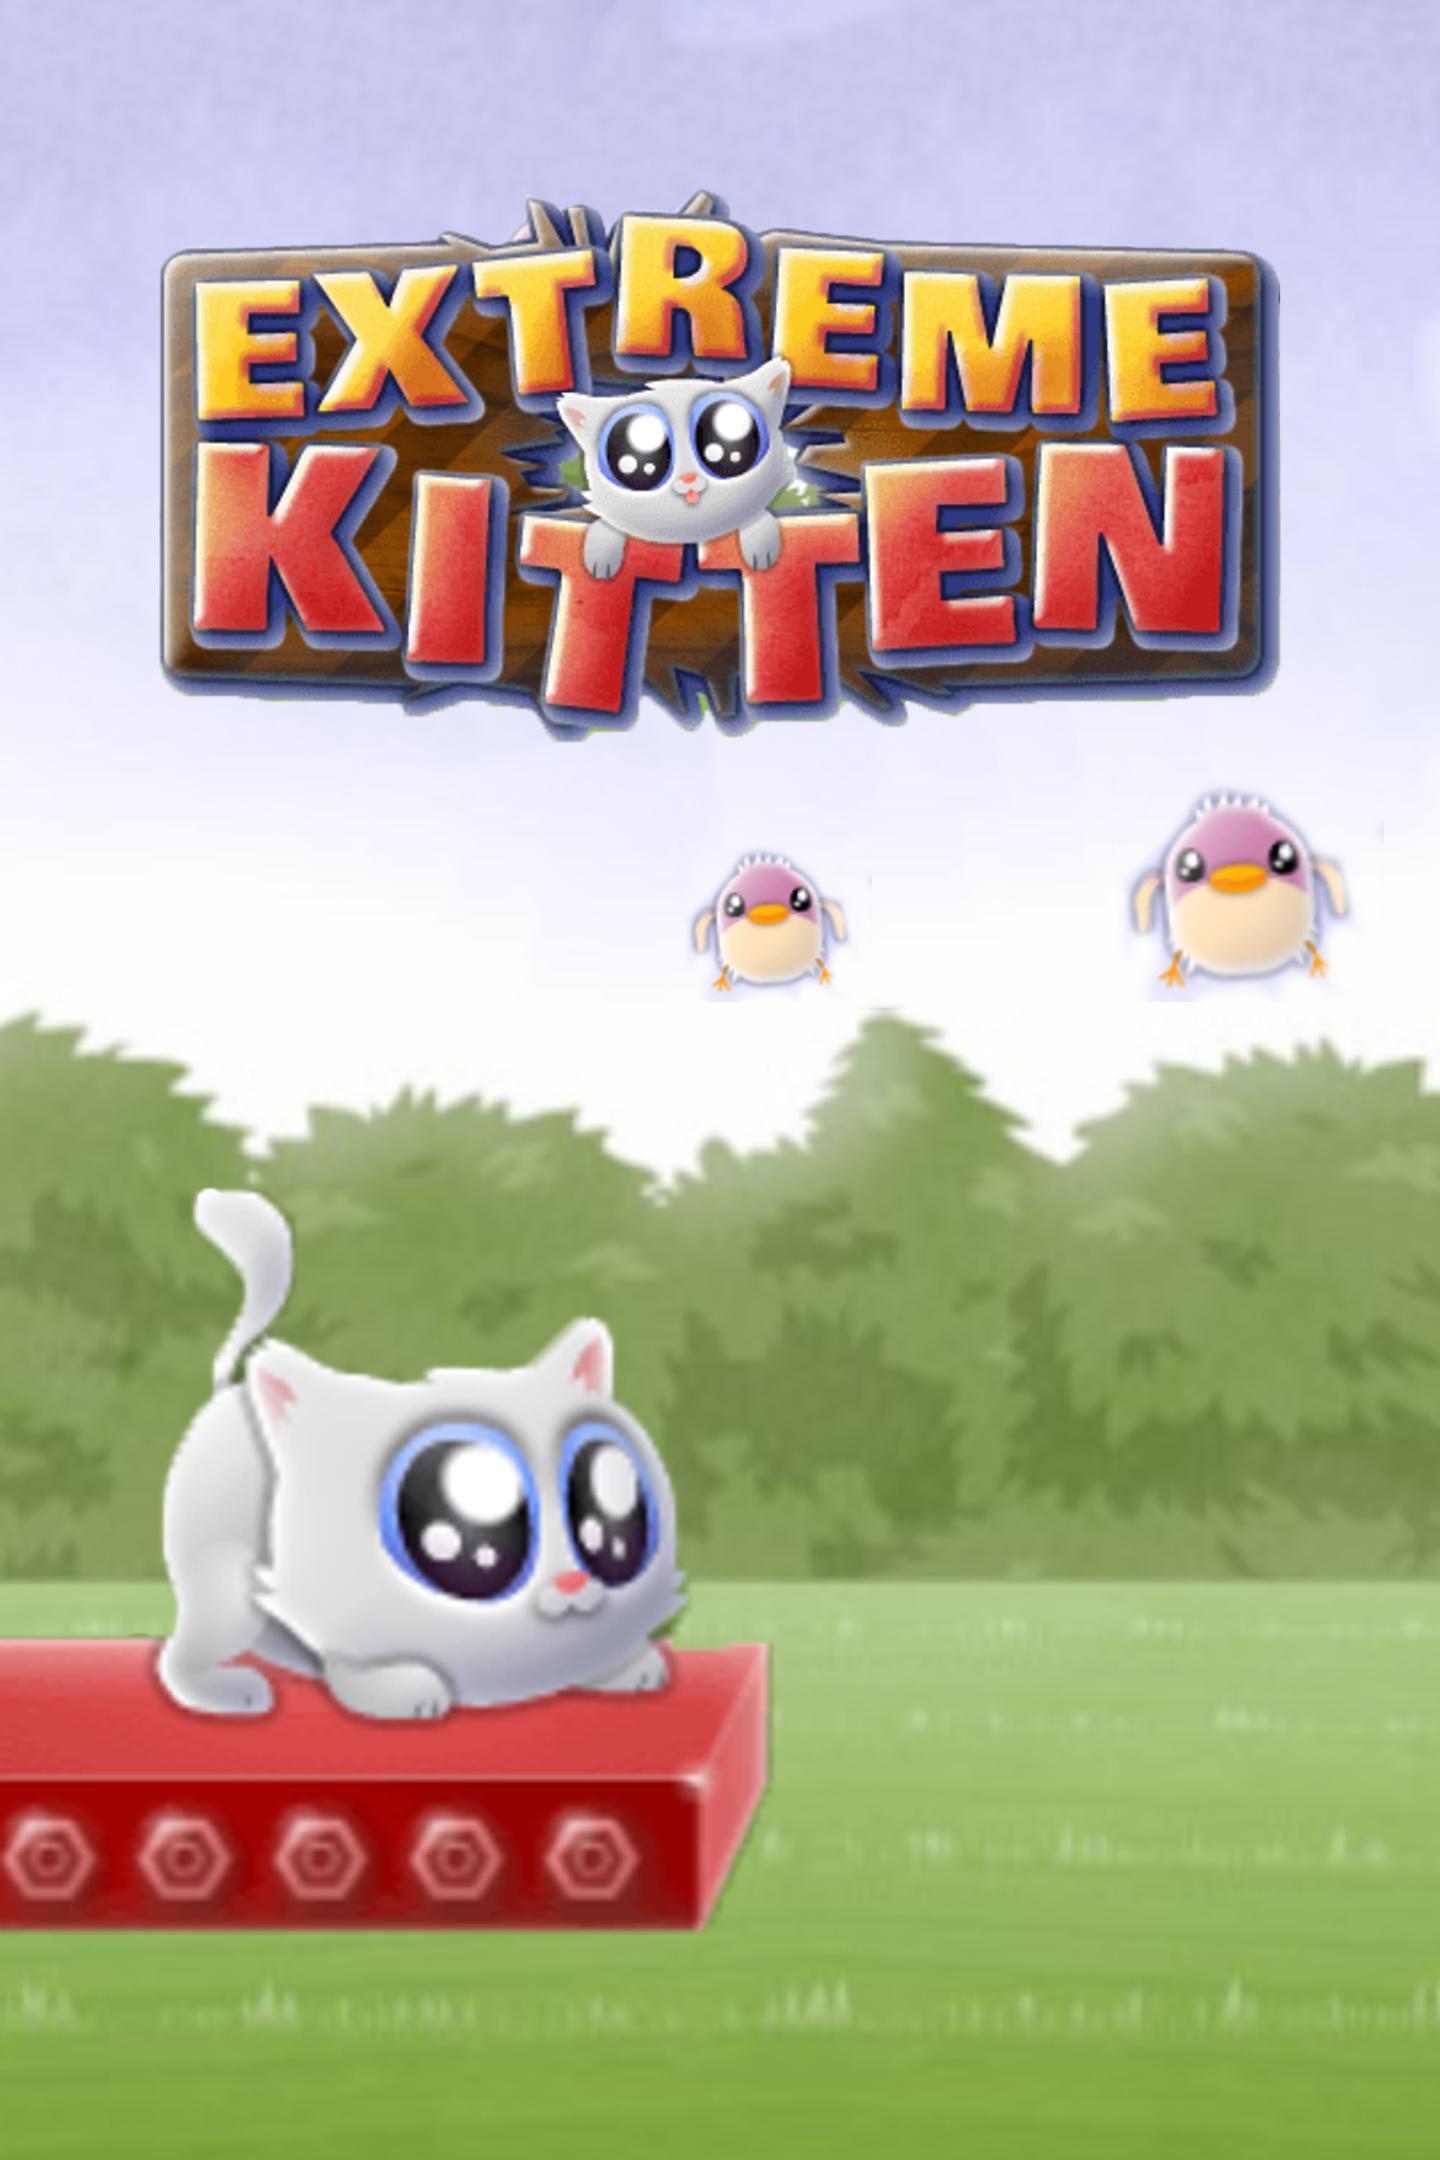 Extreme Classic Kitten